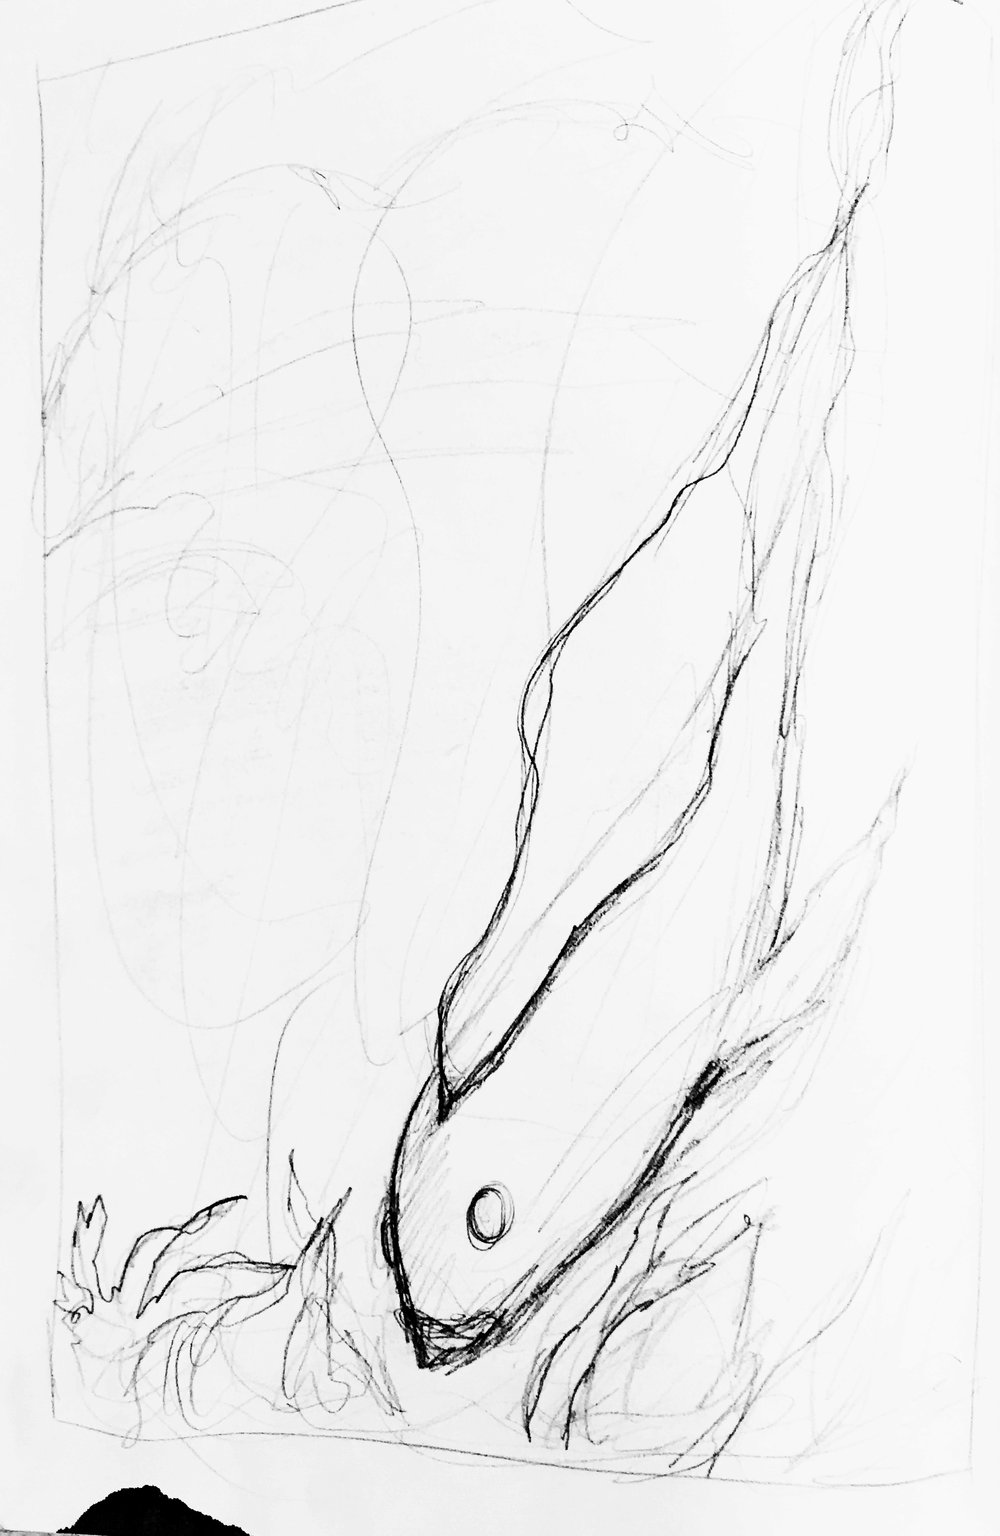 Sketch-Seascape-12.jpg